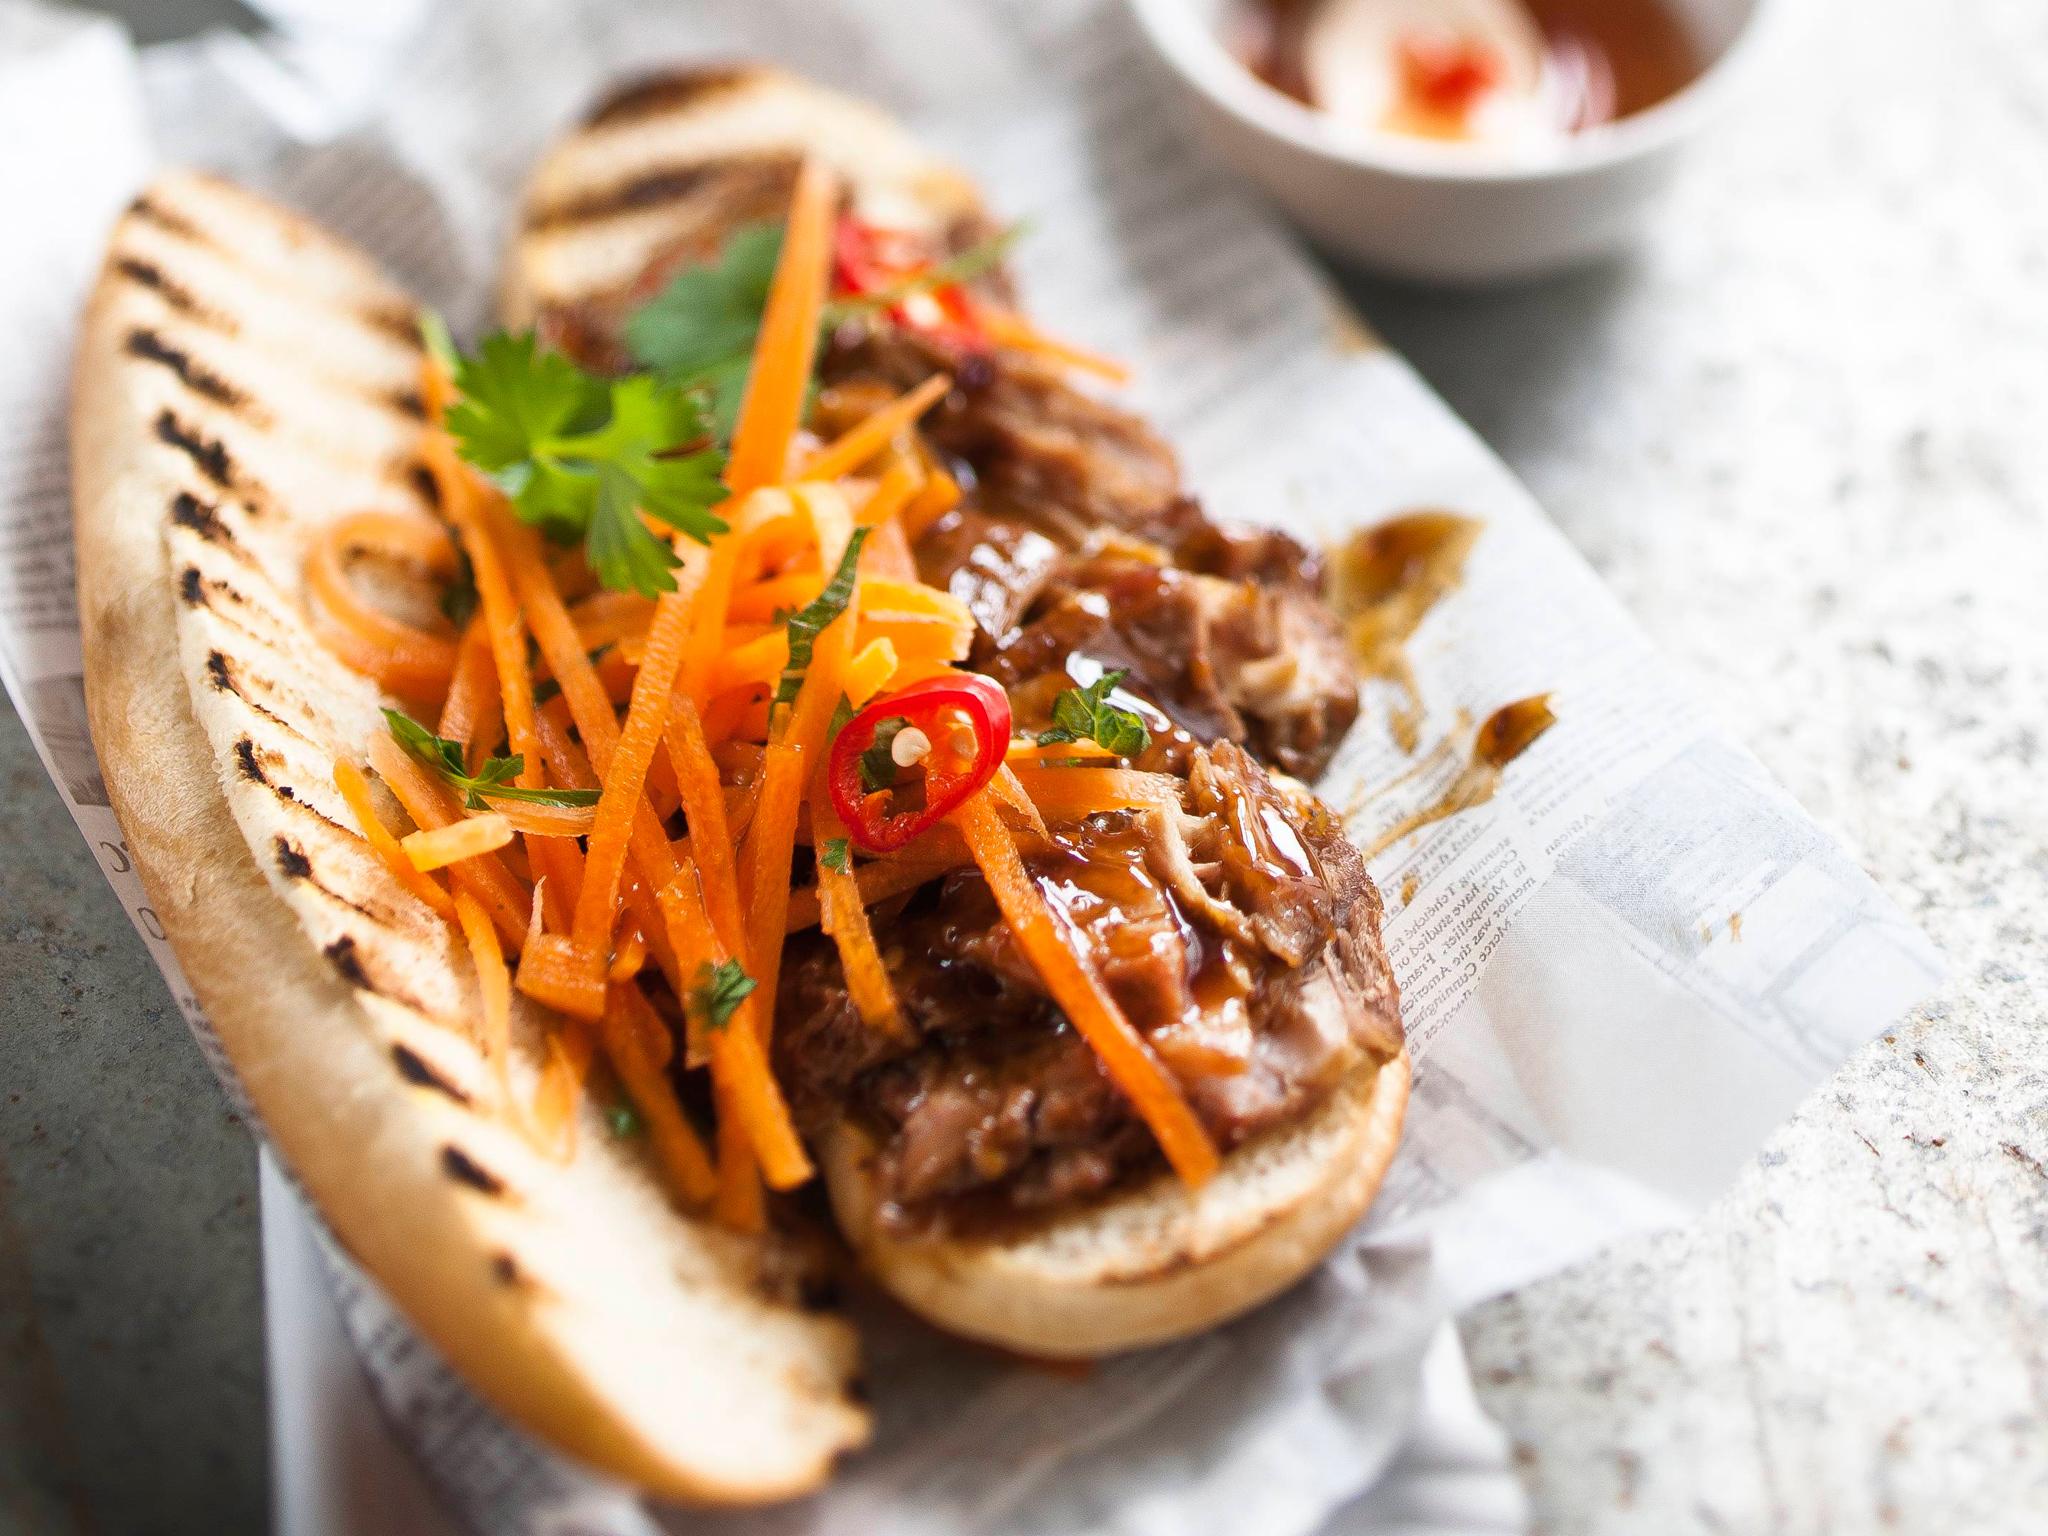 Aasialaiset hot dogit eli hodarit